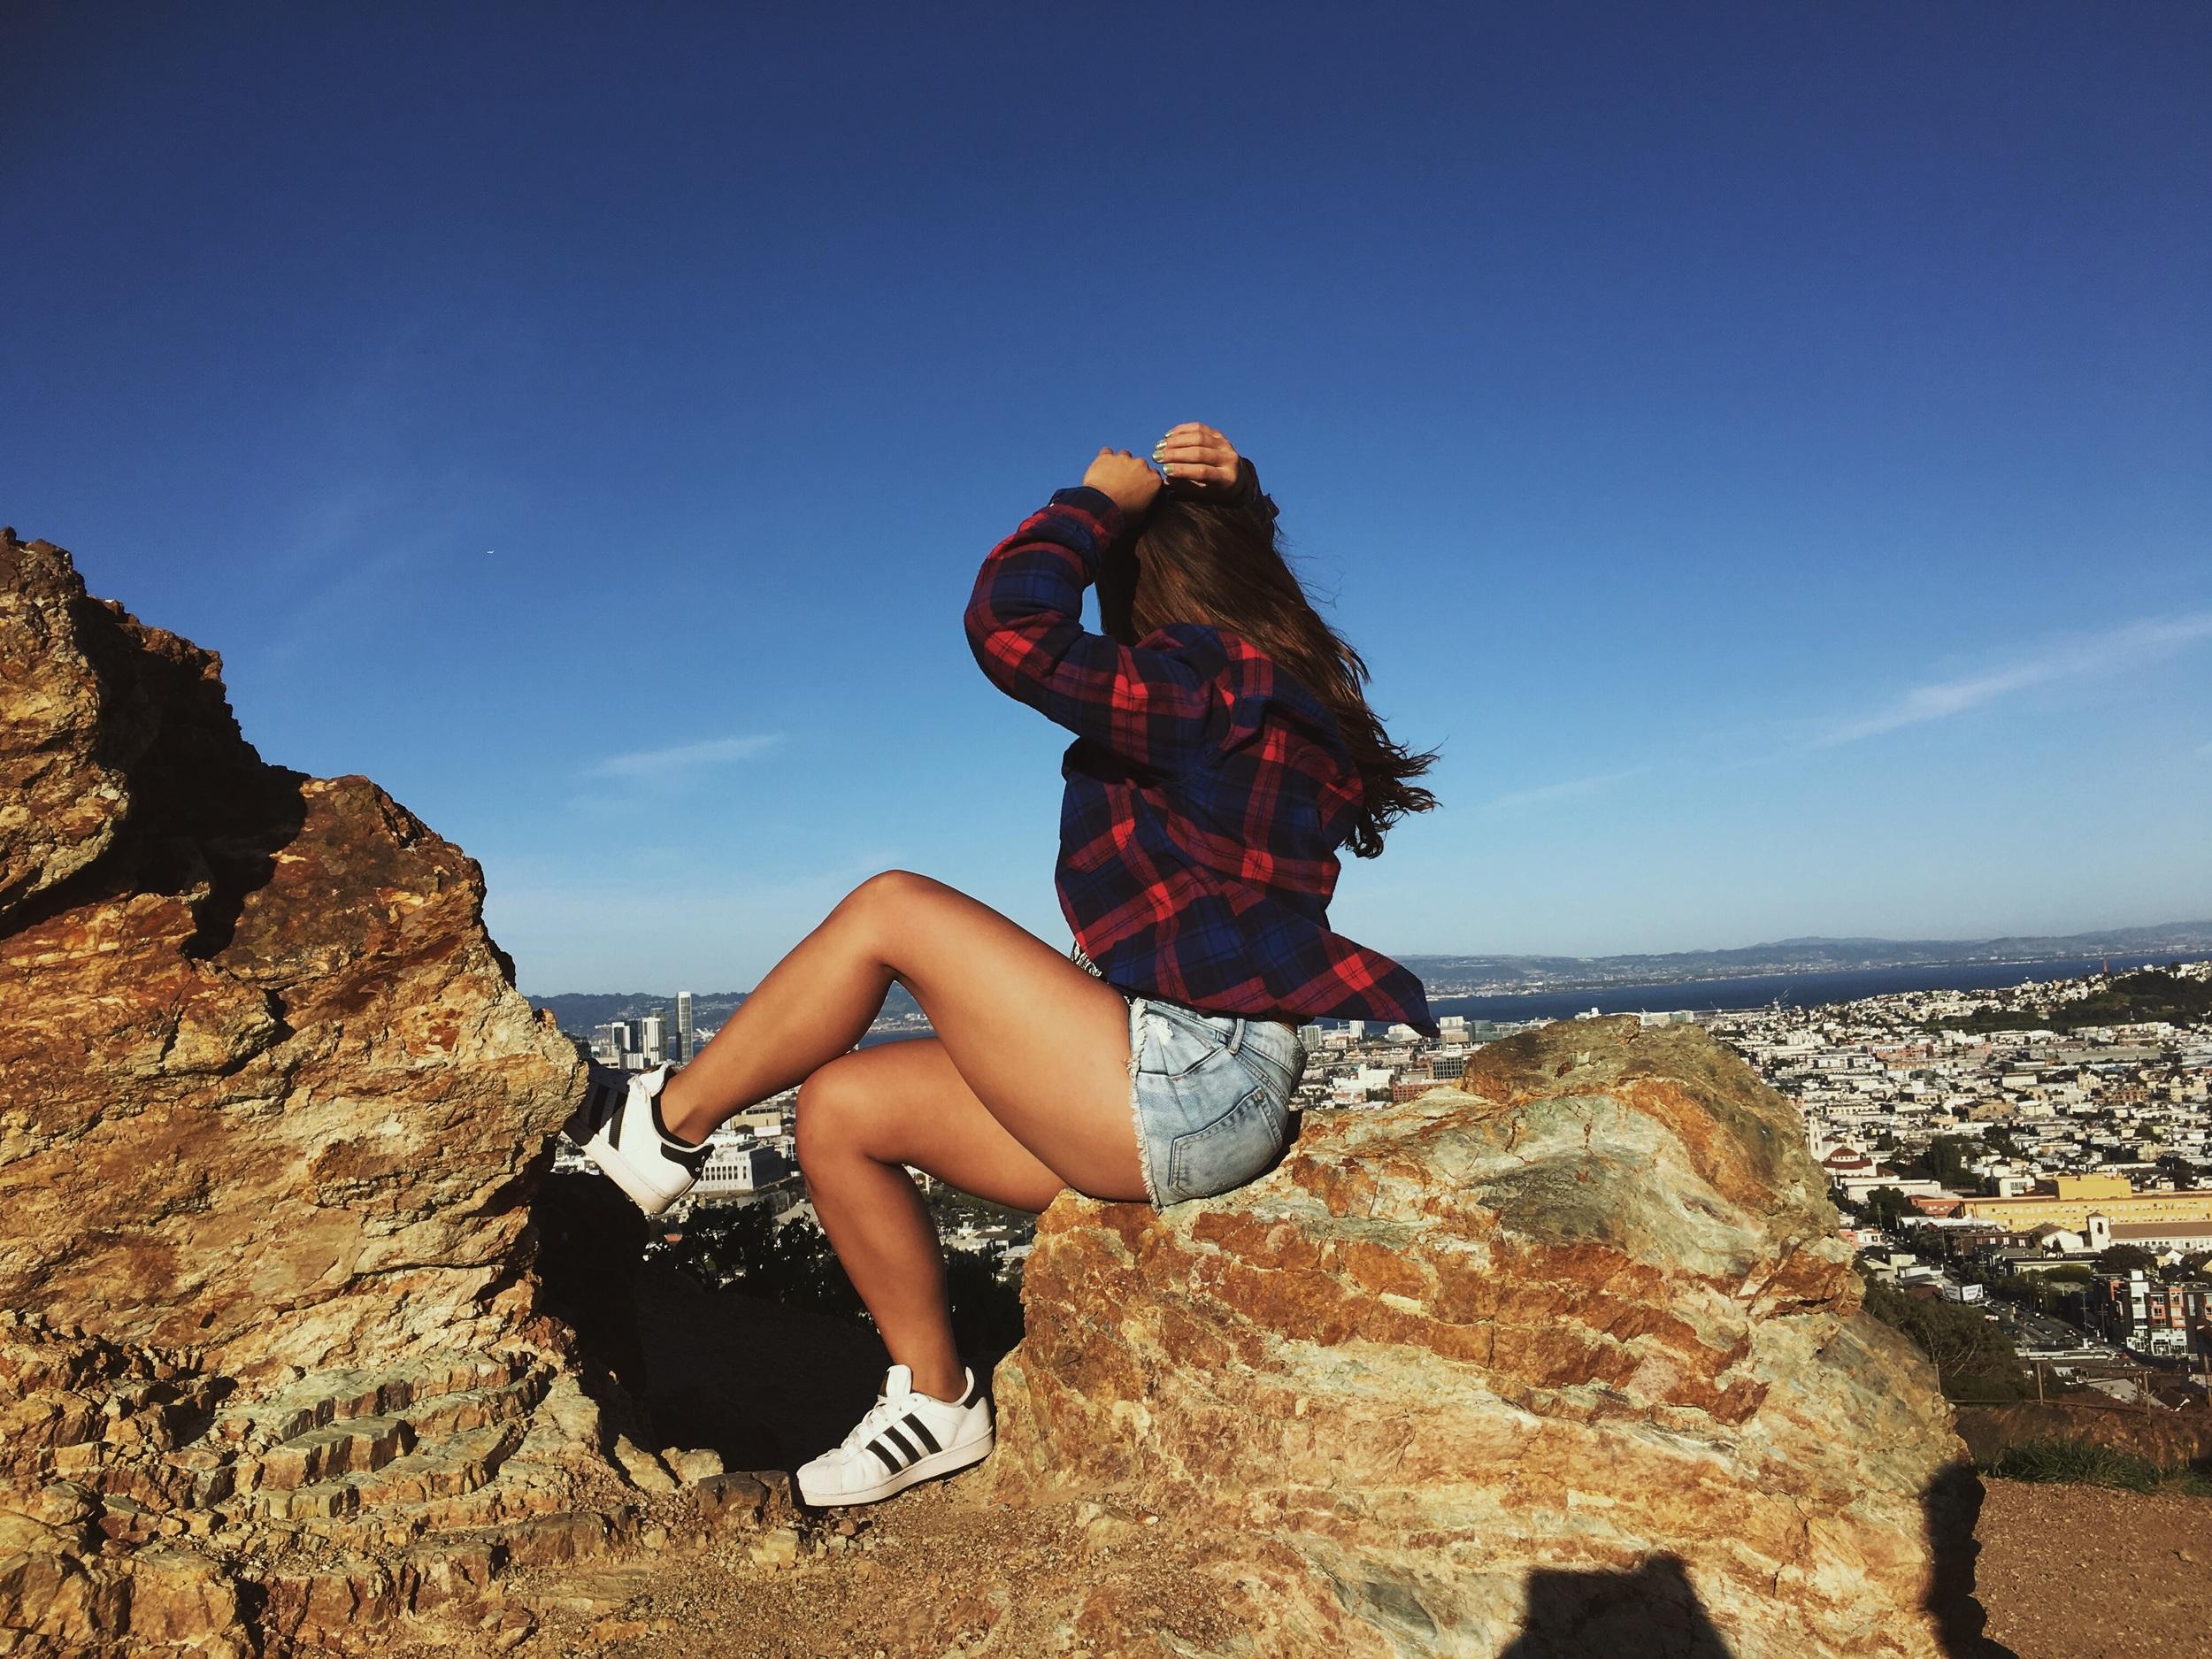 Model: Brianna Abalos  Photographed by: Andrew Krigsman  Location: San Francisco, CA